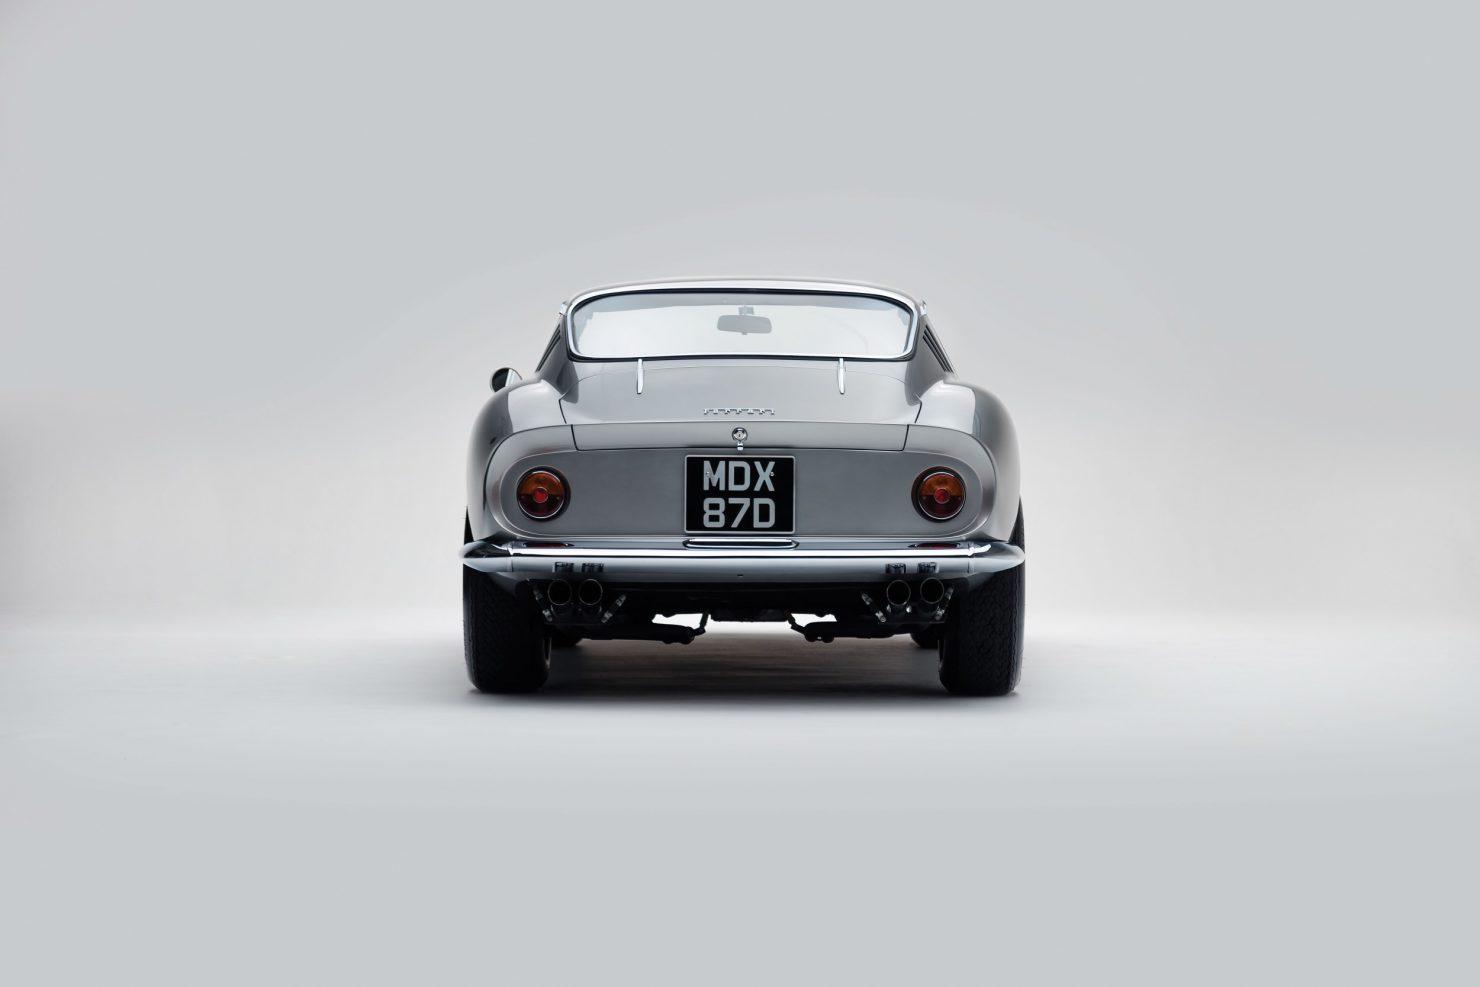 ferrari 275 gtb car 10 1480x987 - 1965 Ferrari 275 GTB/6C Alloy